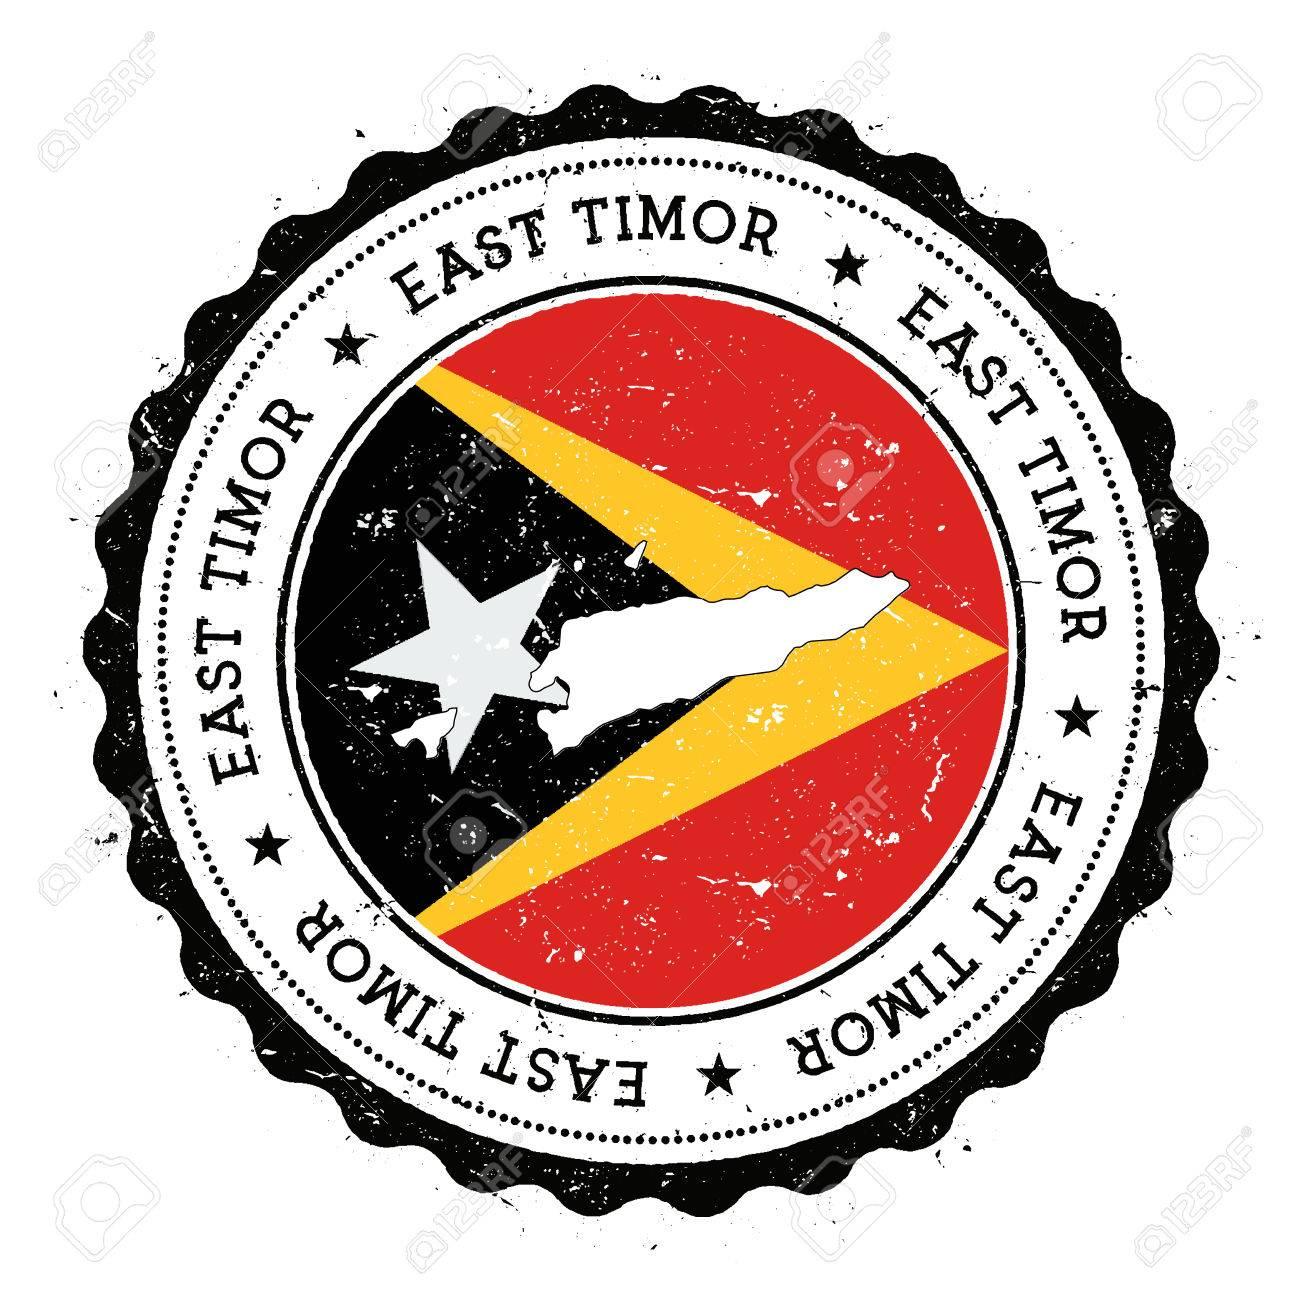 TimorLeste Map And Flag In Vintage Rubber Stamp Of State Colours - East timor seetimor leste map vector